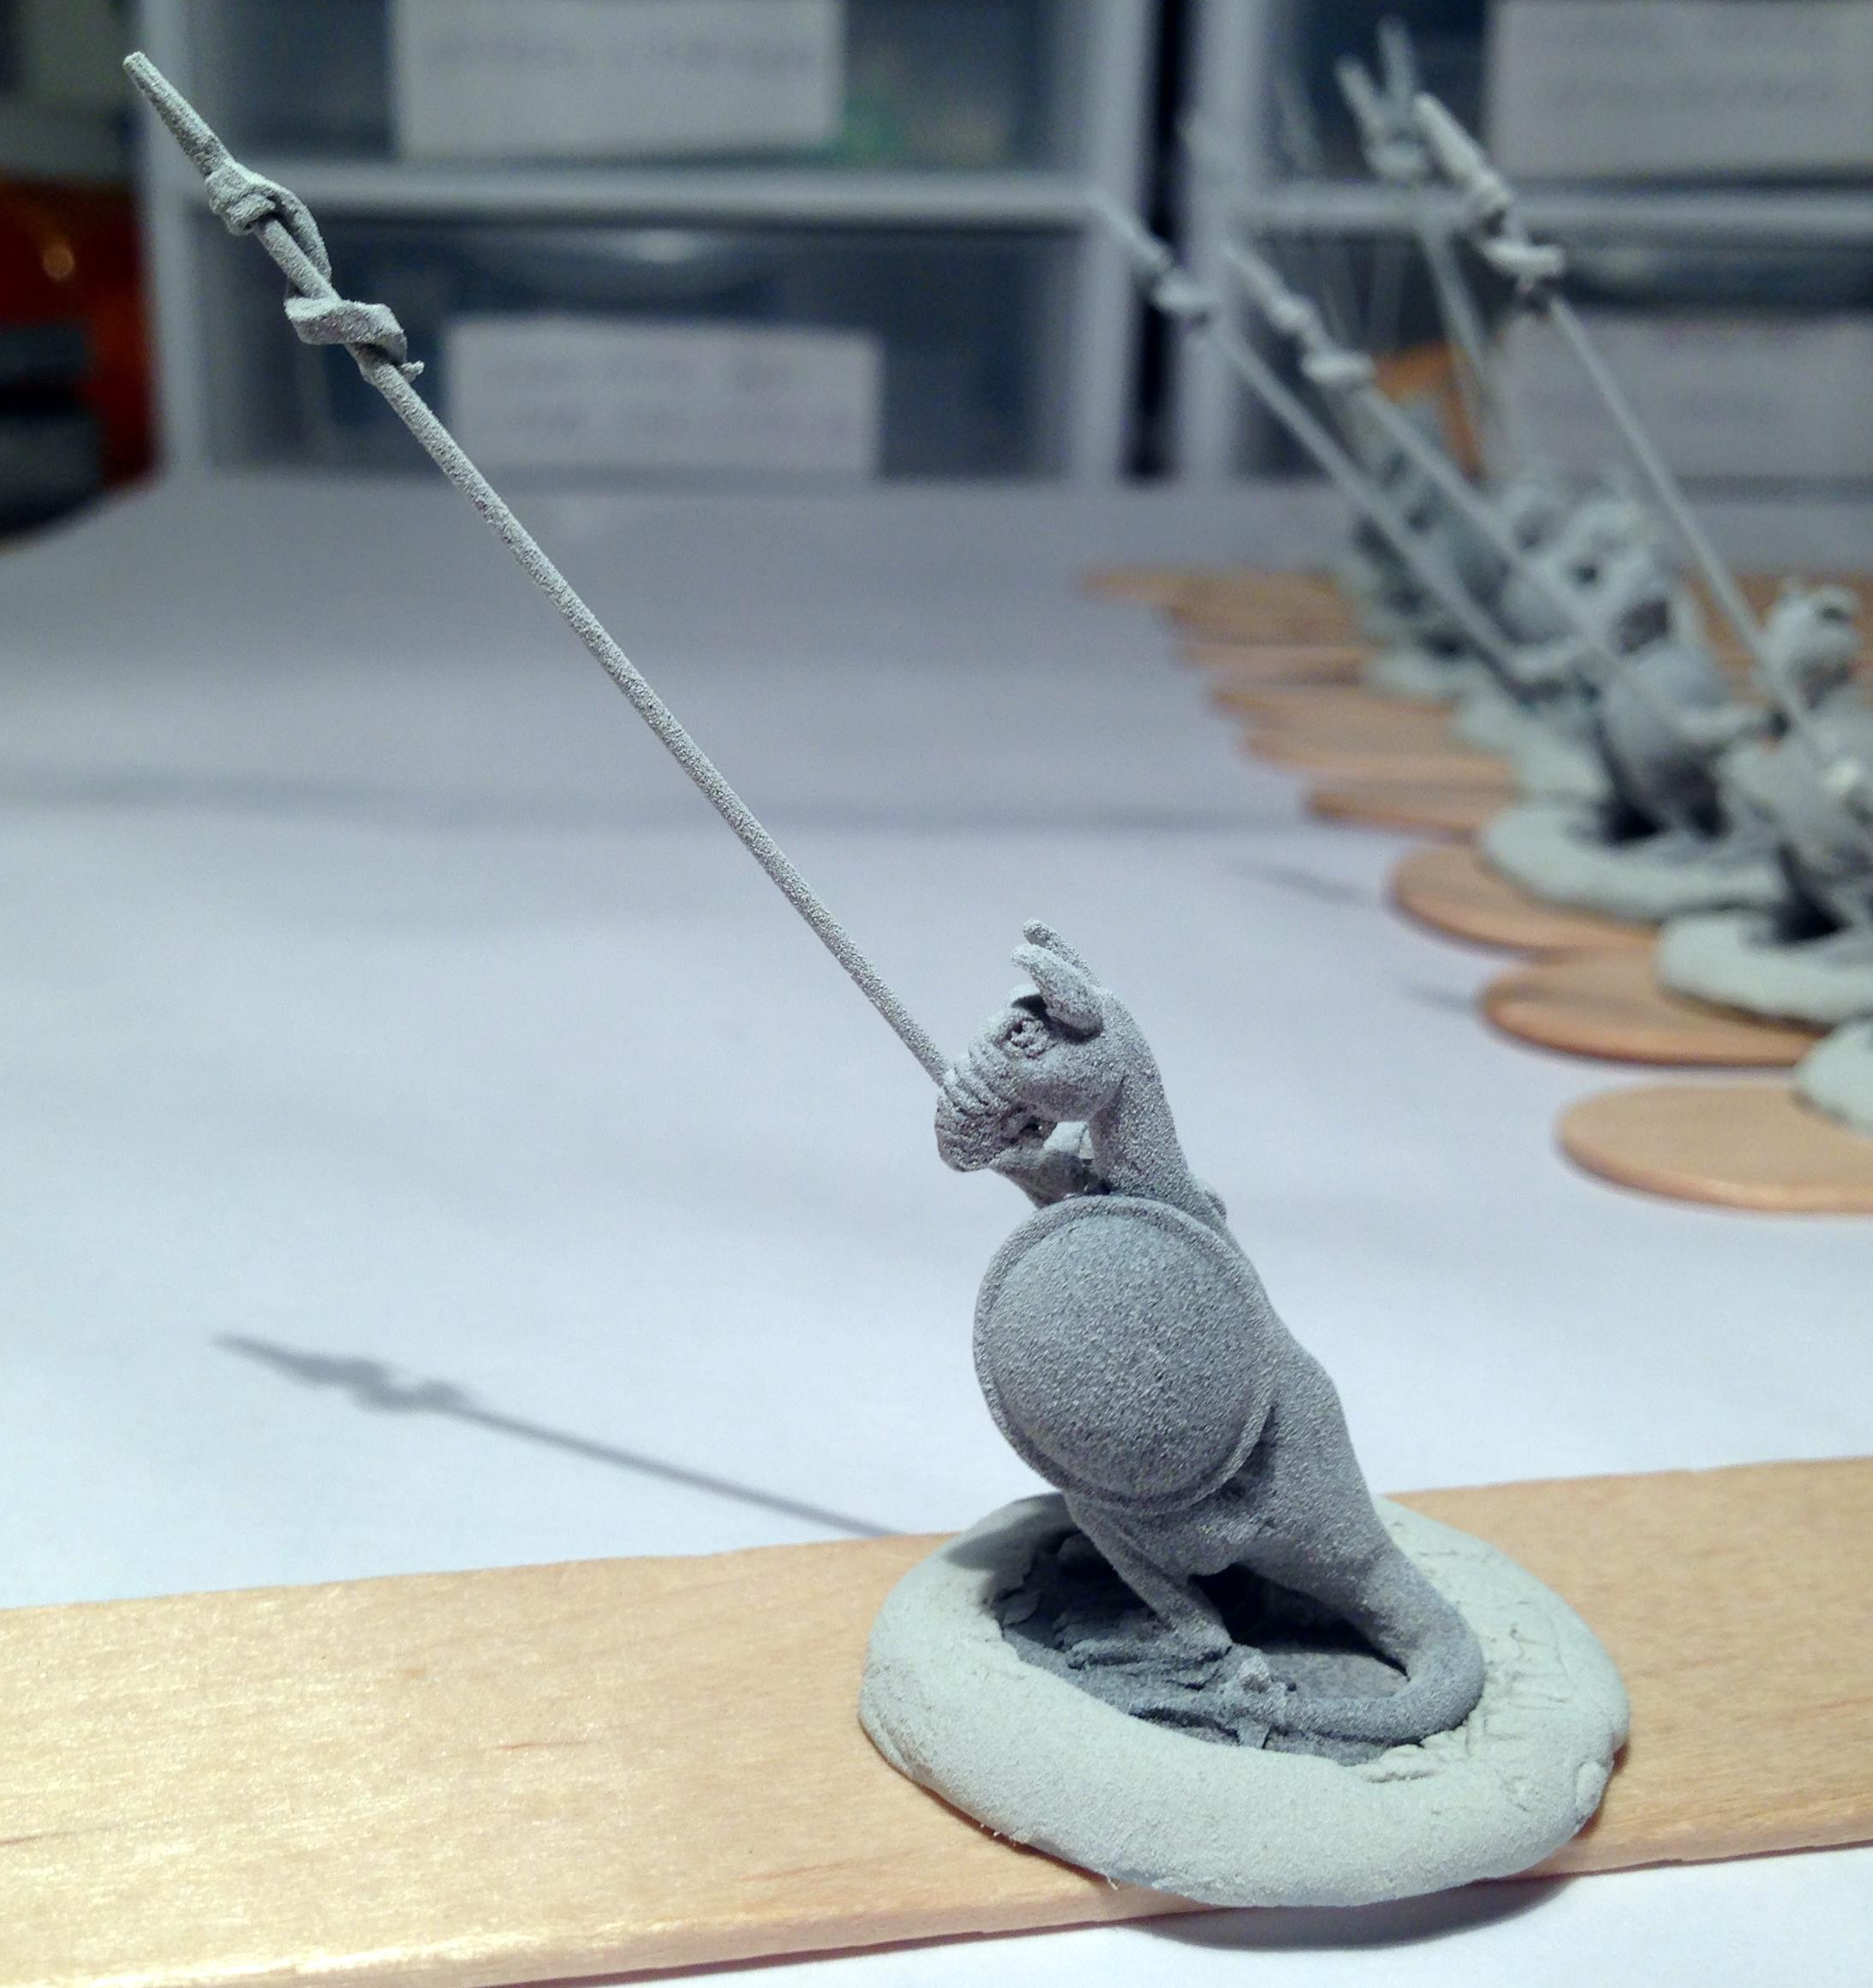 8 Rooman trooper newer pike side view shield side